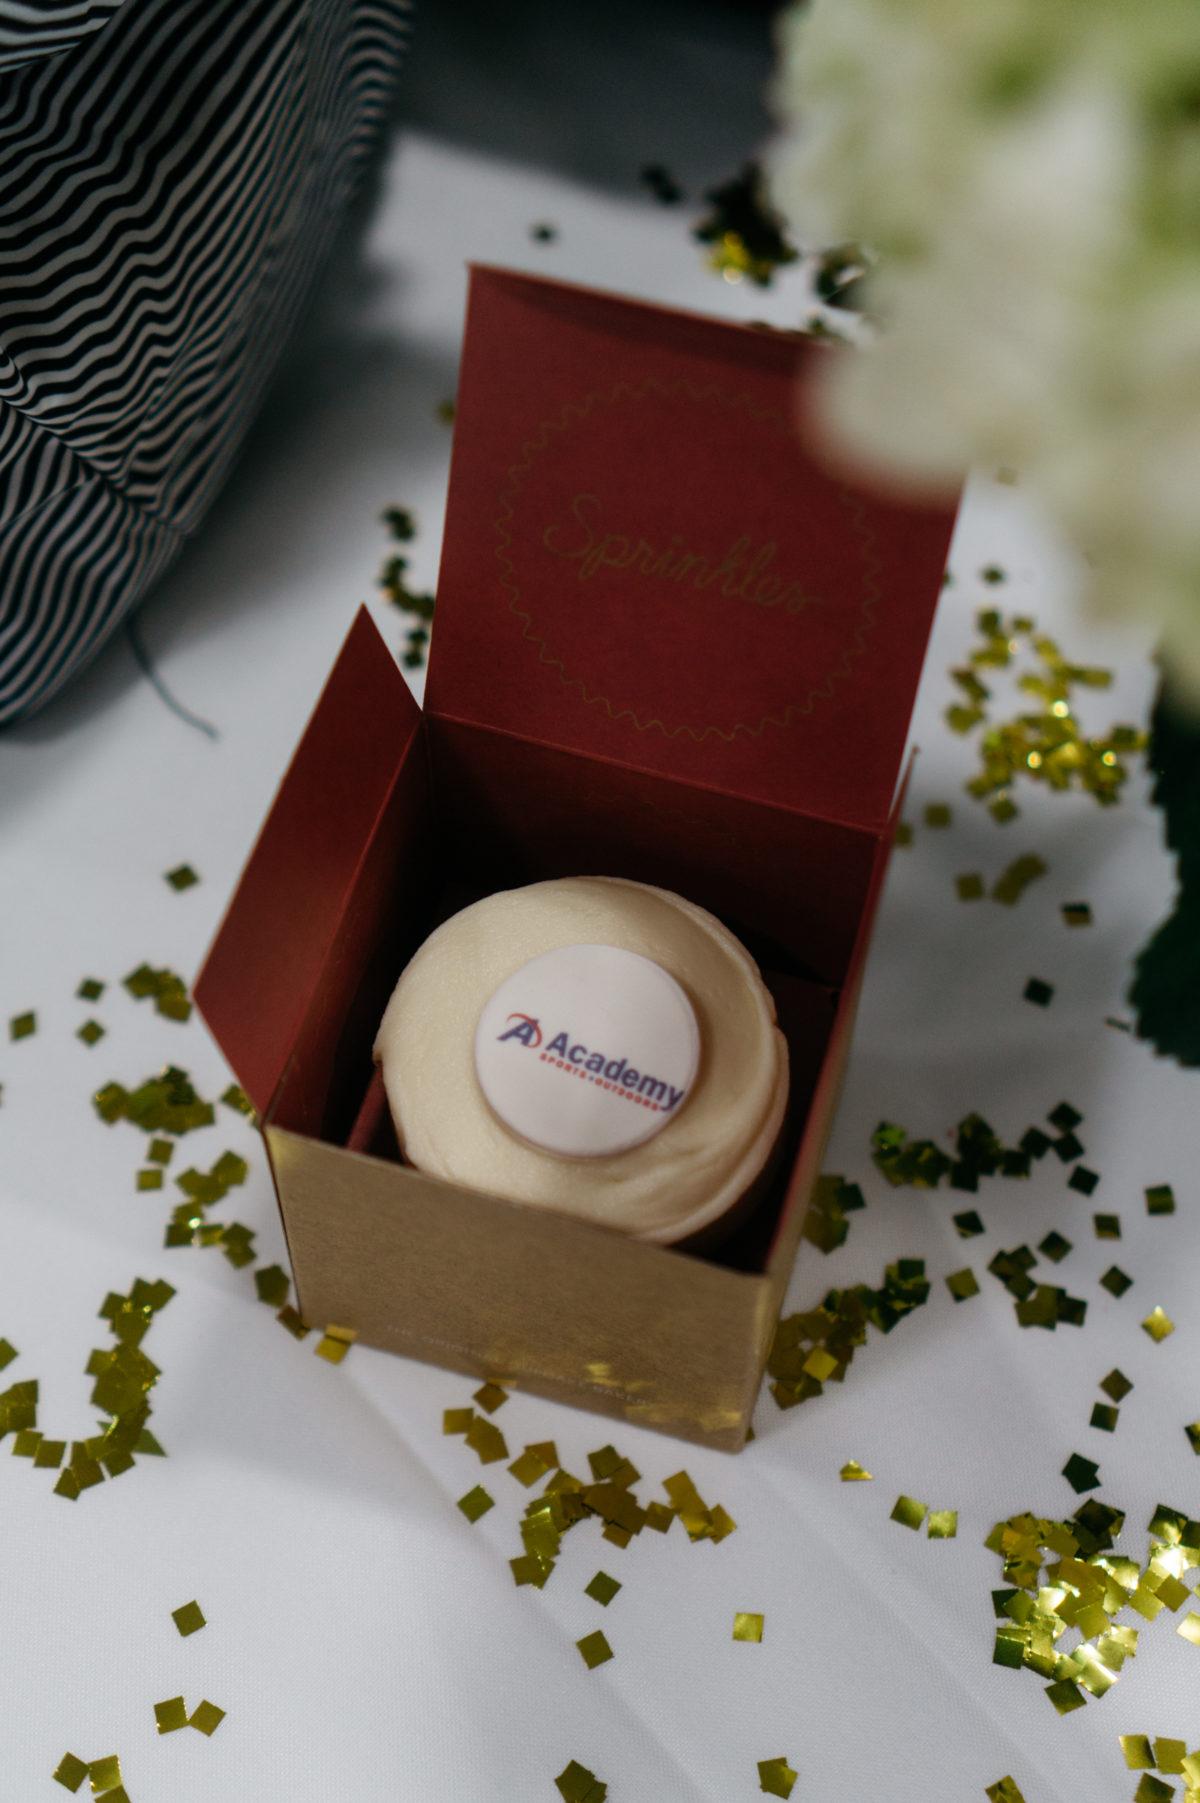 Academy cupcake